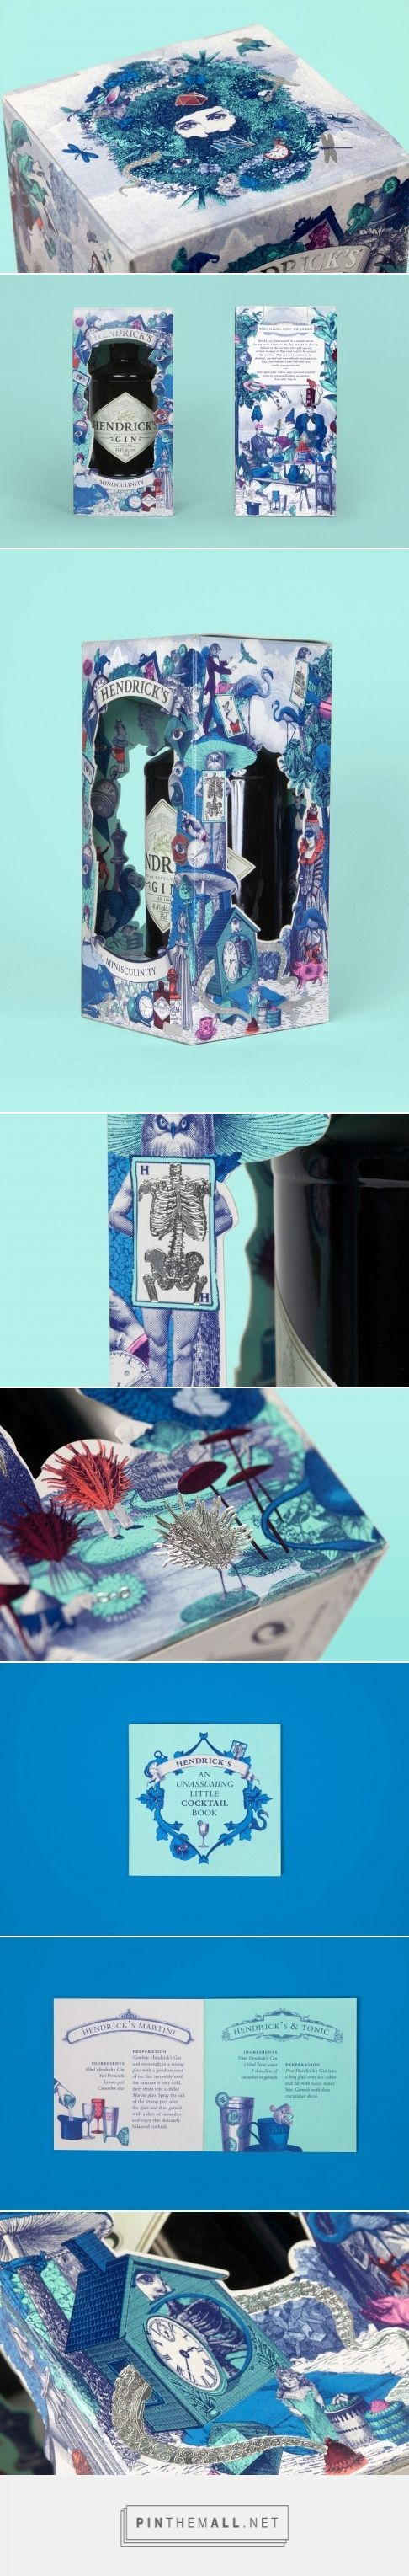 Hendrick's Minisculinity Packaging by Here Design   Fivestar Branding – Design and Branding Agency & Inspiration Gallery: